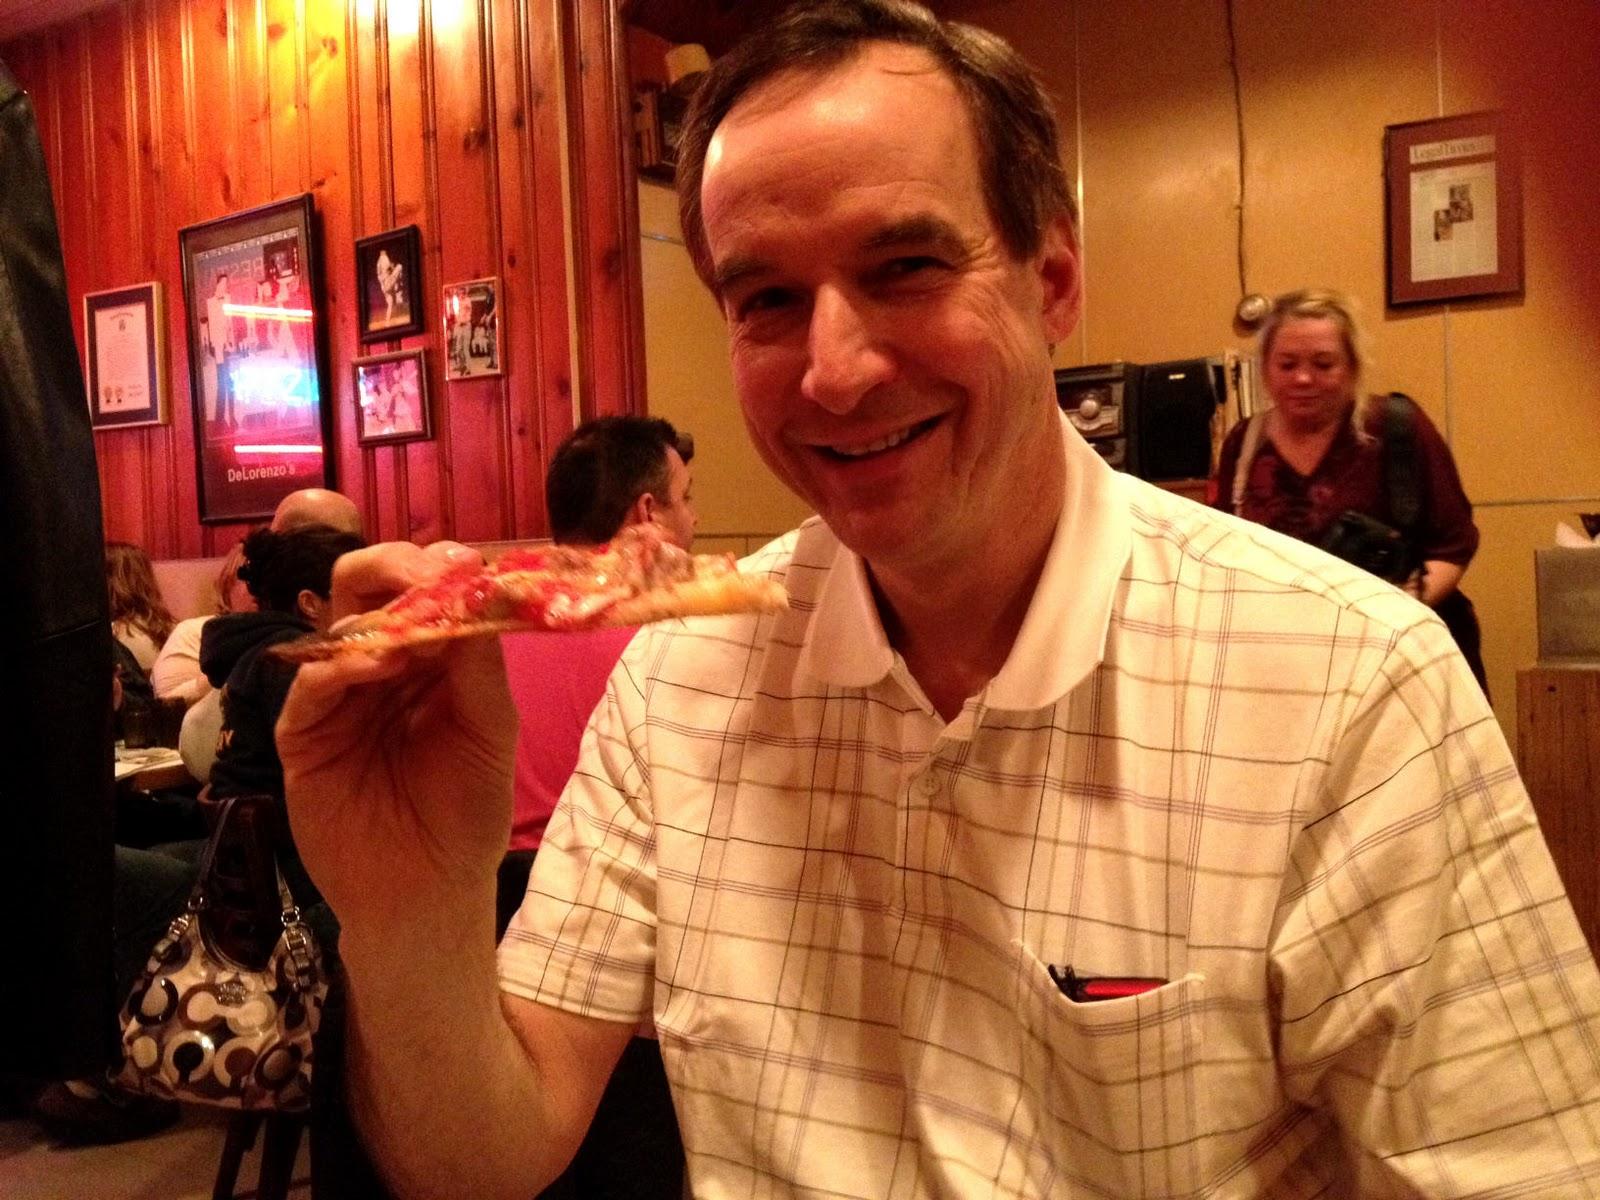 pizza quixote review delorenzo s tomato pies hudson st trenton nj this is great pizza no crust flop